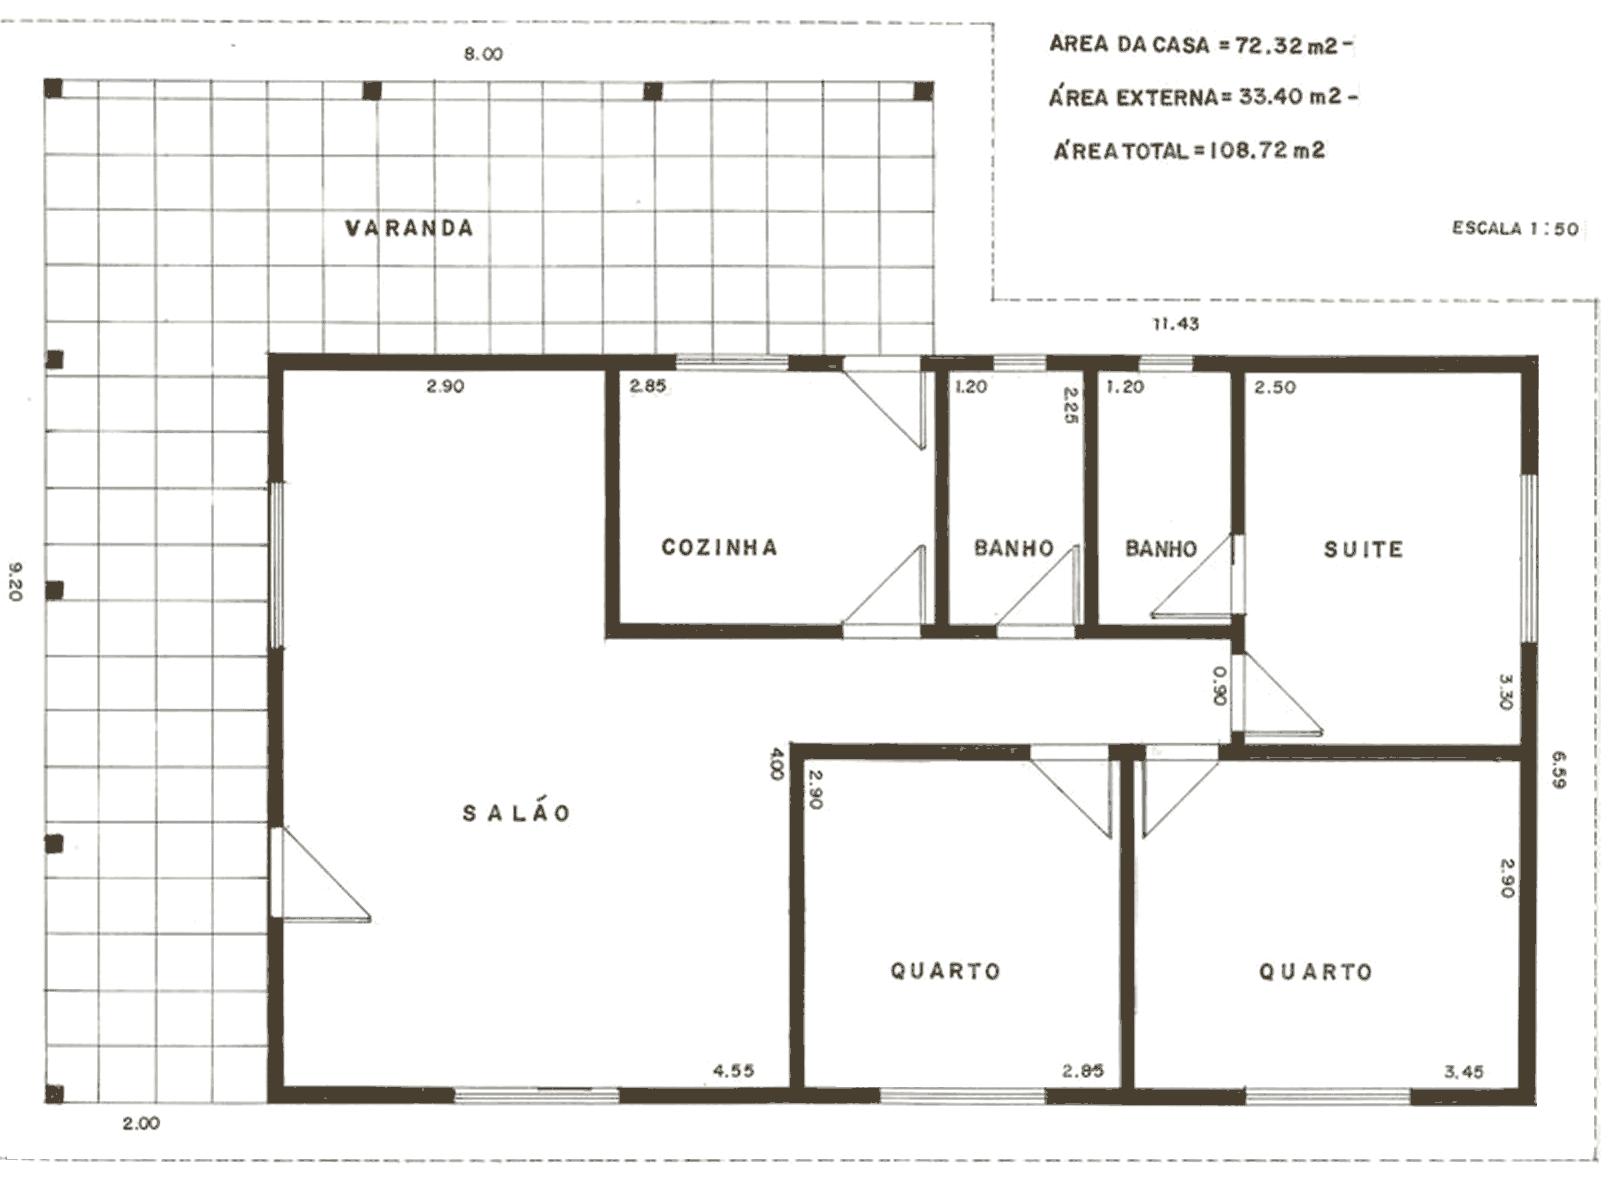 Plantas de casas para construir – Modelos Grátis #3F3527 1620 1179